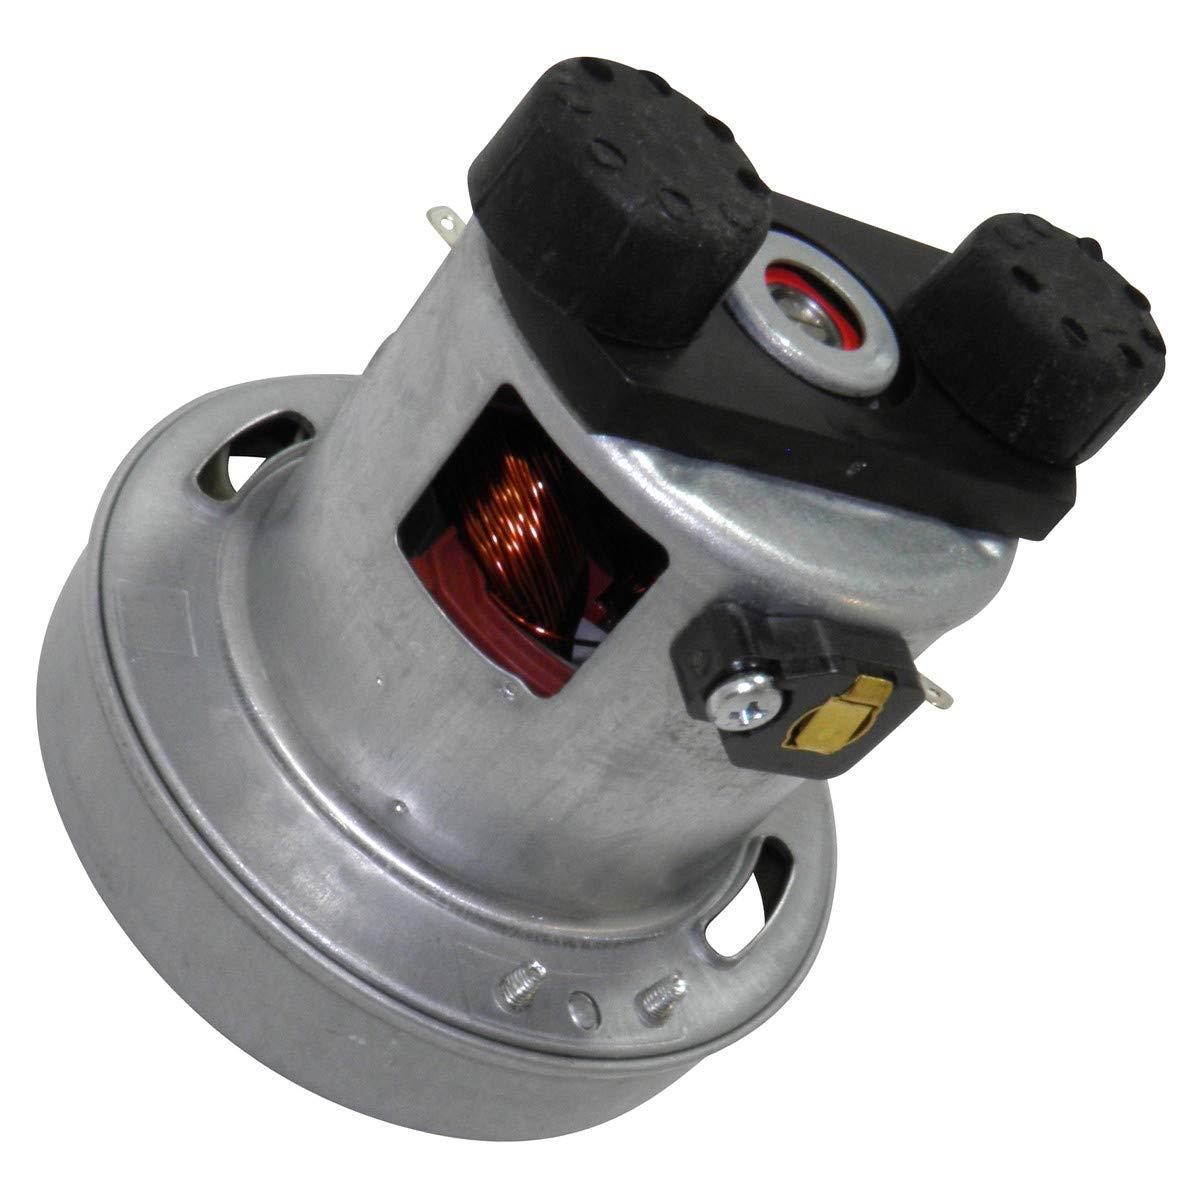 Rowenta motore 23800TS-L aspirapolvere Compact Power Cyclonic RO3798 RO3799